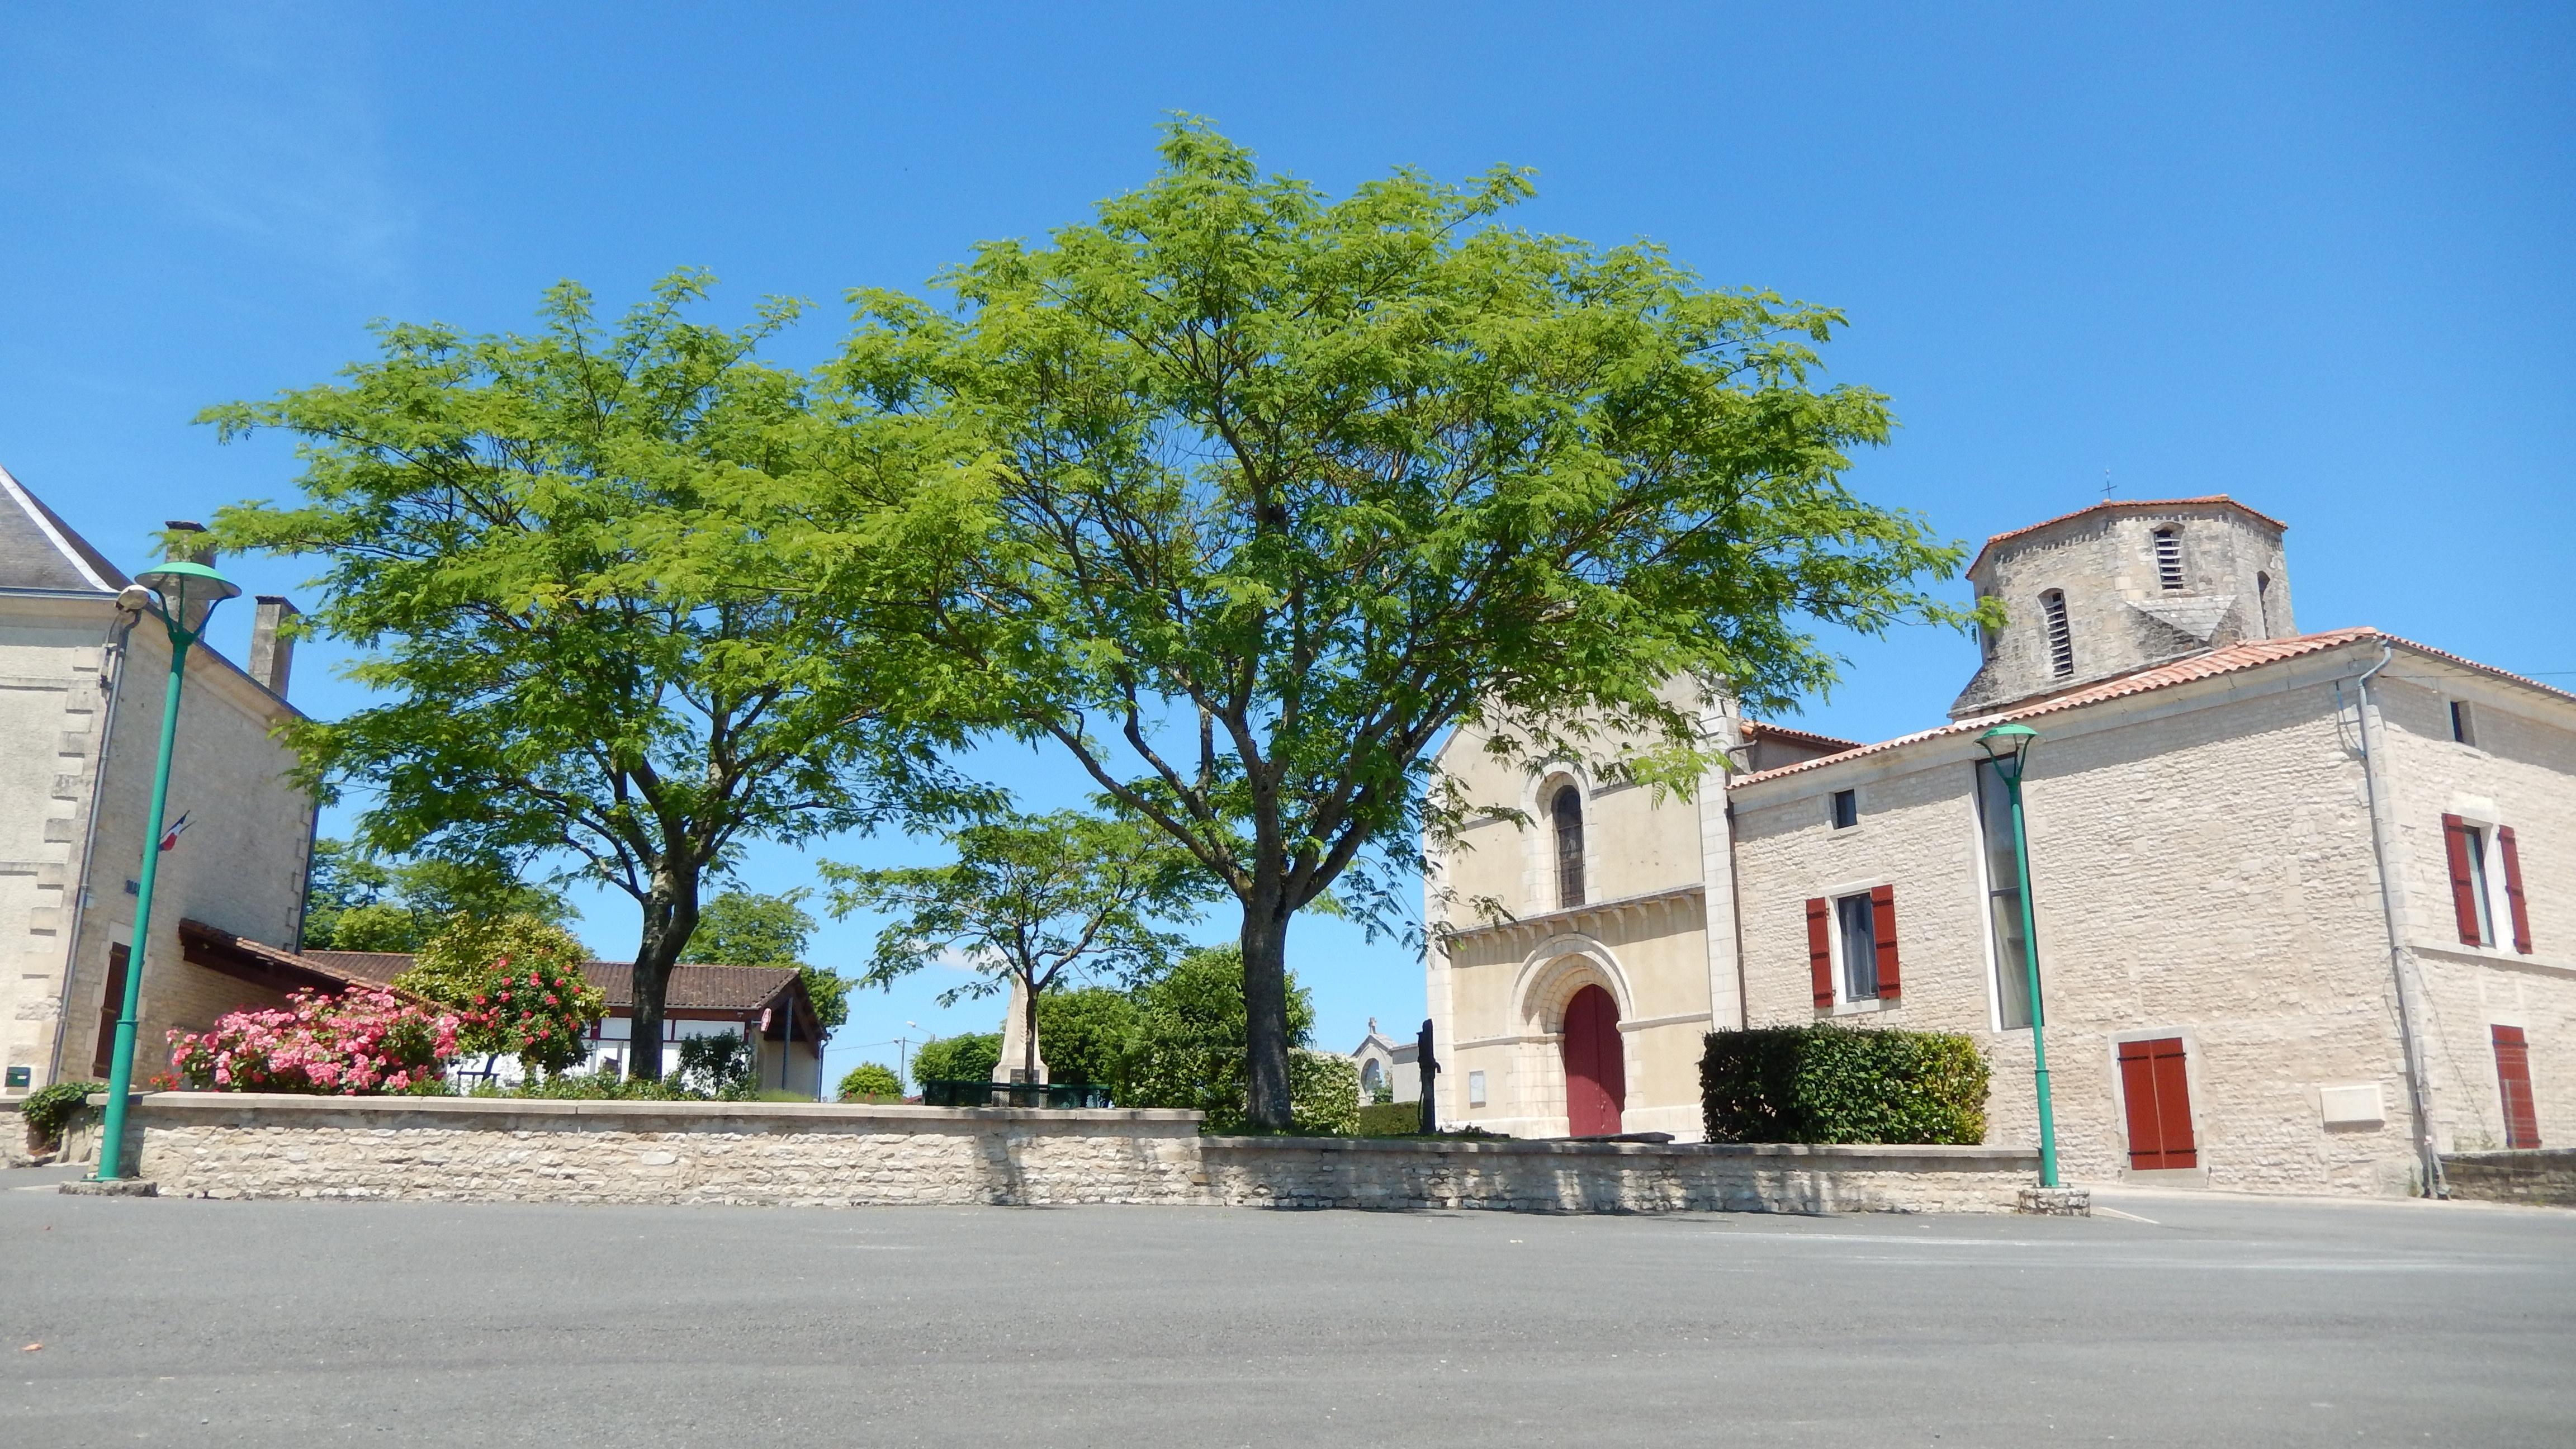 Saint-Seine l'Abbaye GR2 section 1